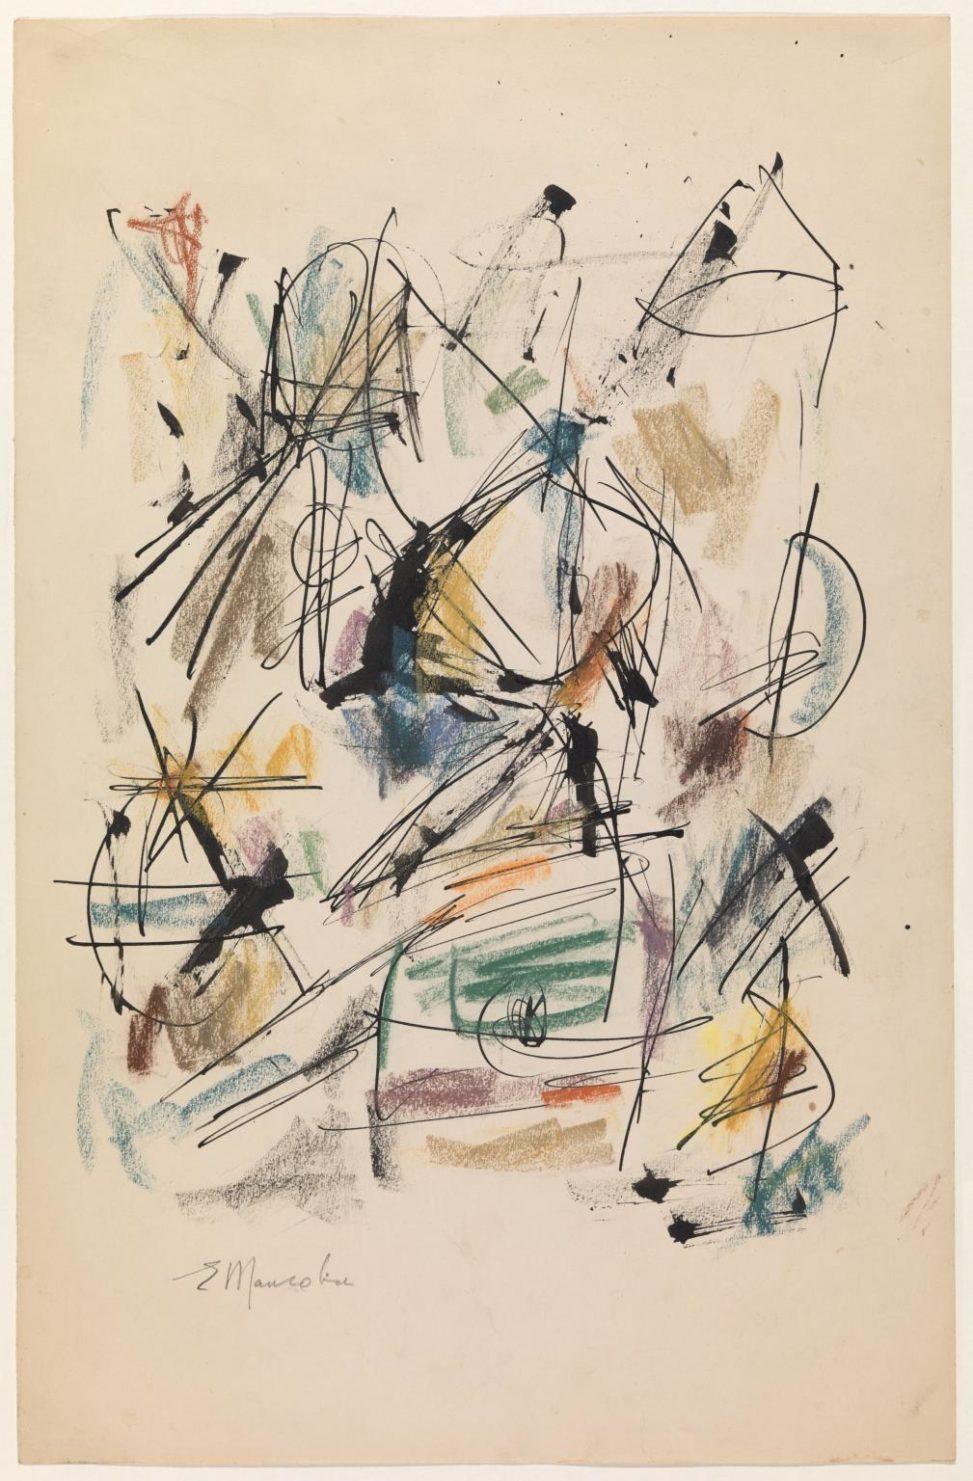 Ernest Mancoba, ink + pastel on paper, Tate Modern